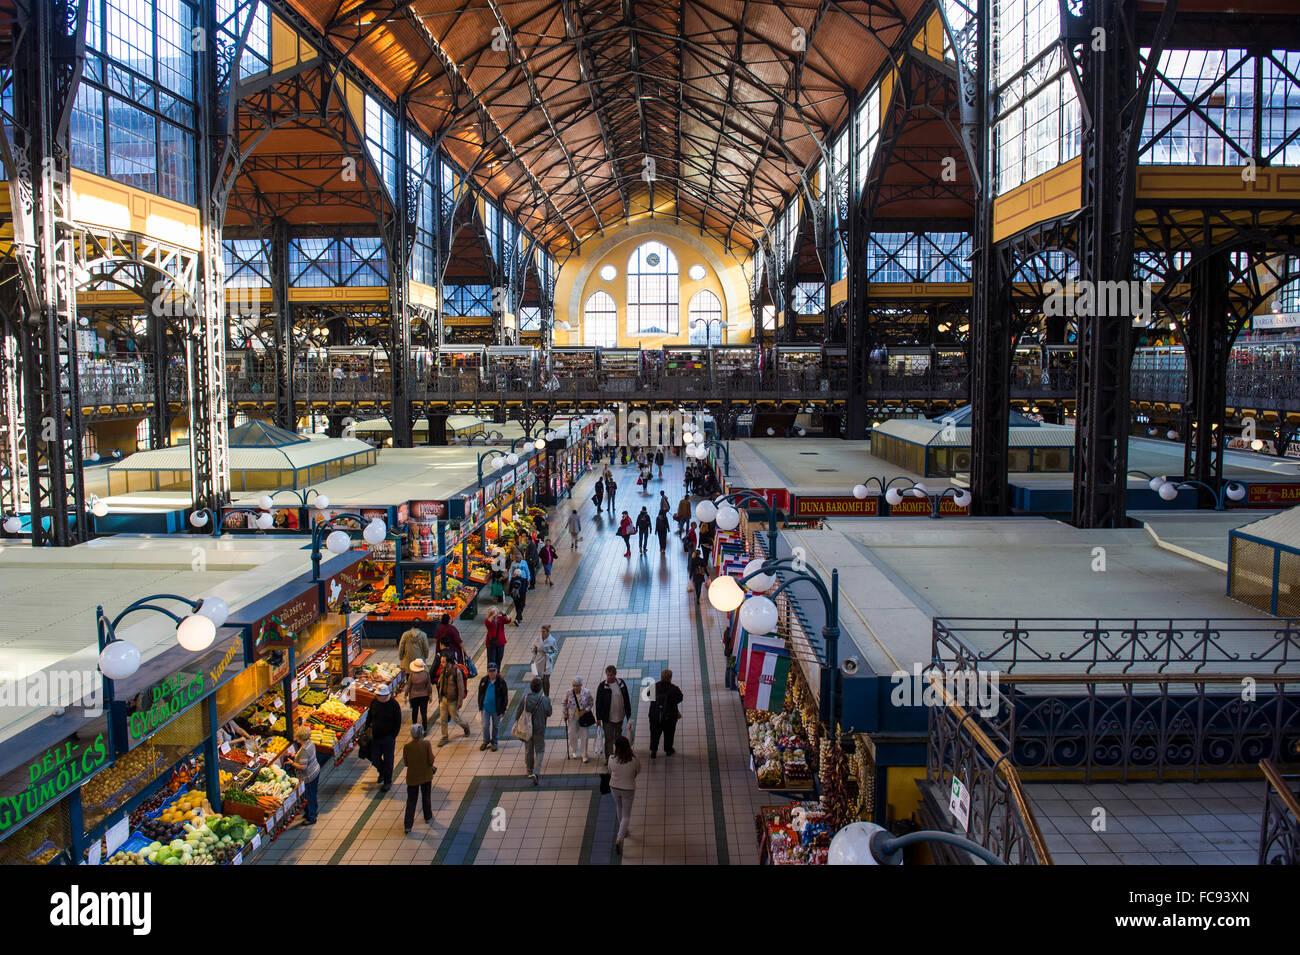 Grand market hall, Budapest, Hungary, Europe - Stock Image